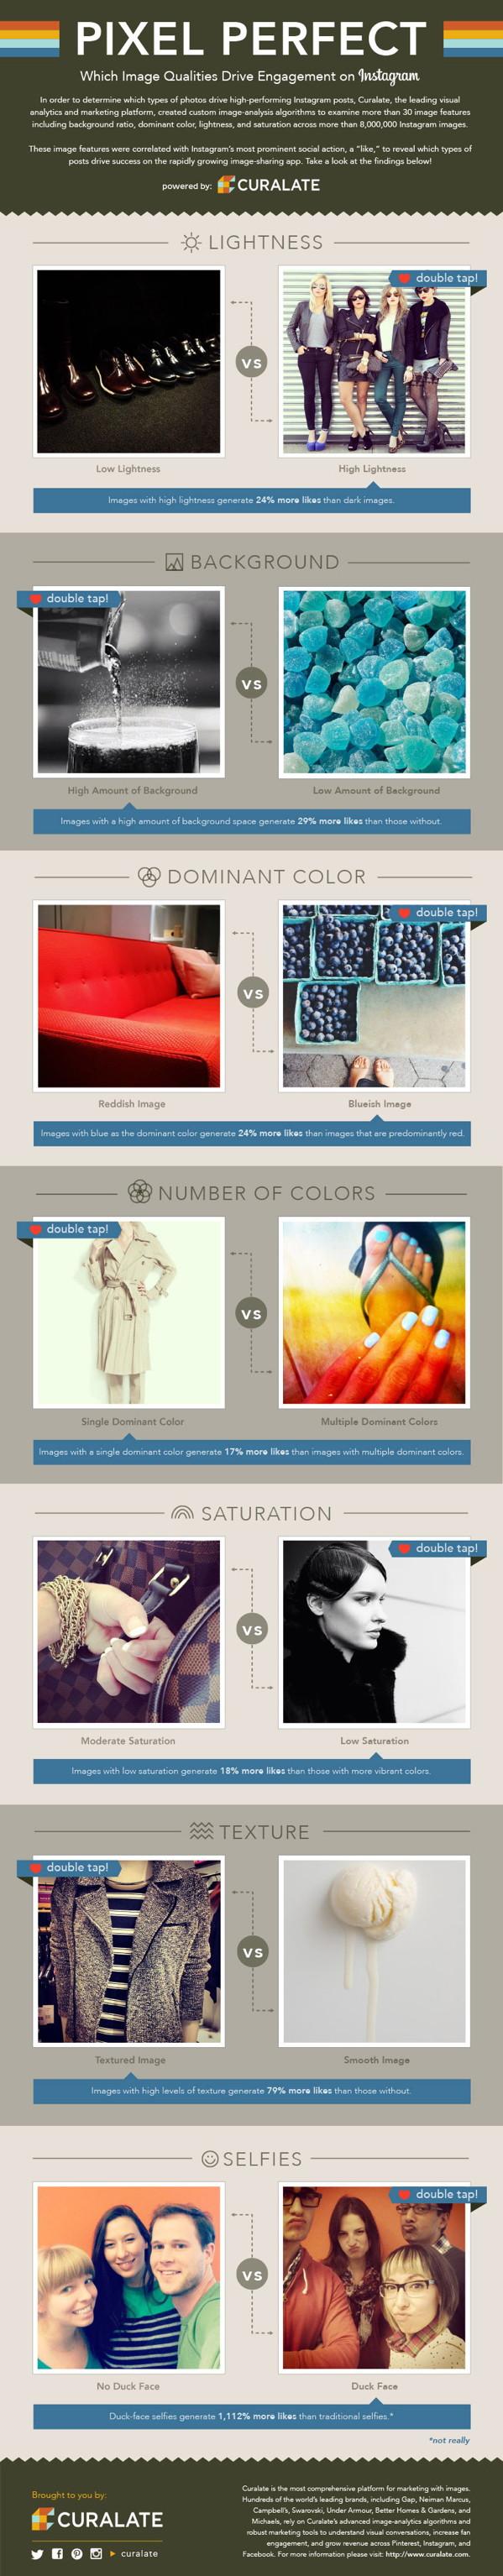 instagram-success-engagement-infographic